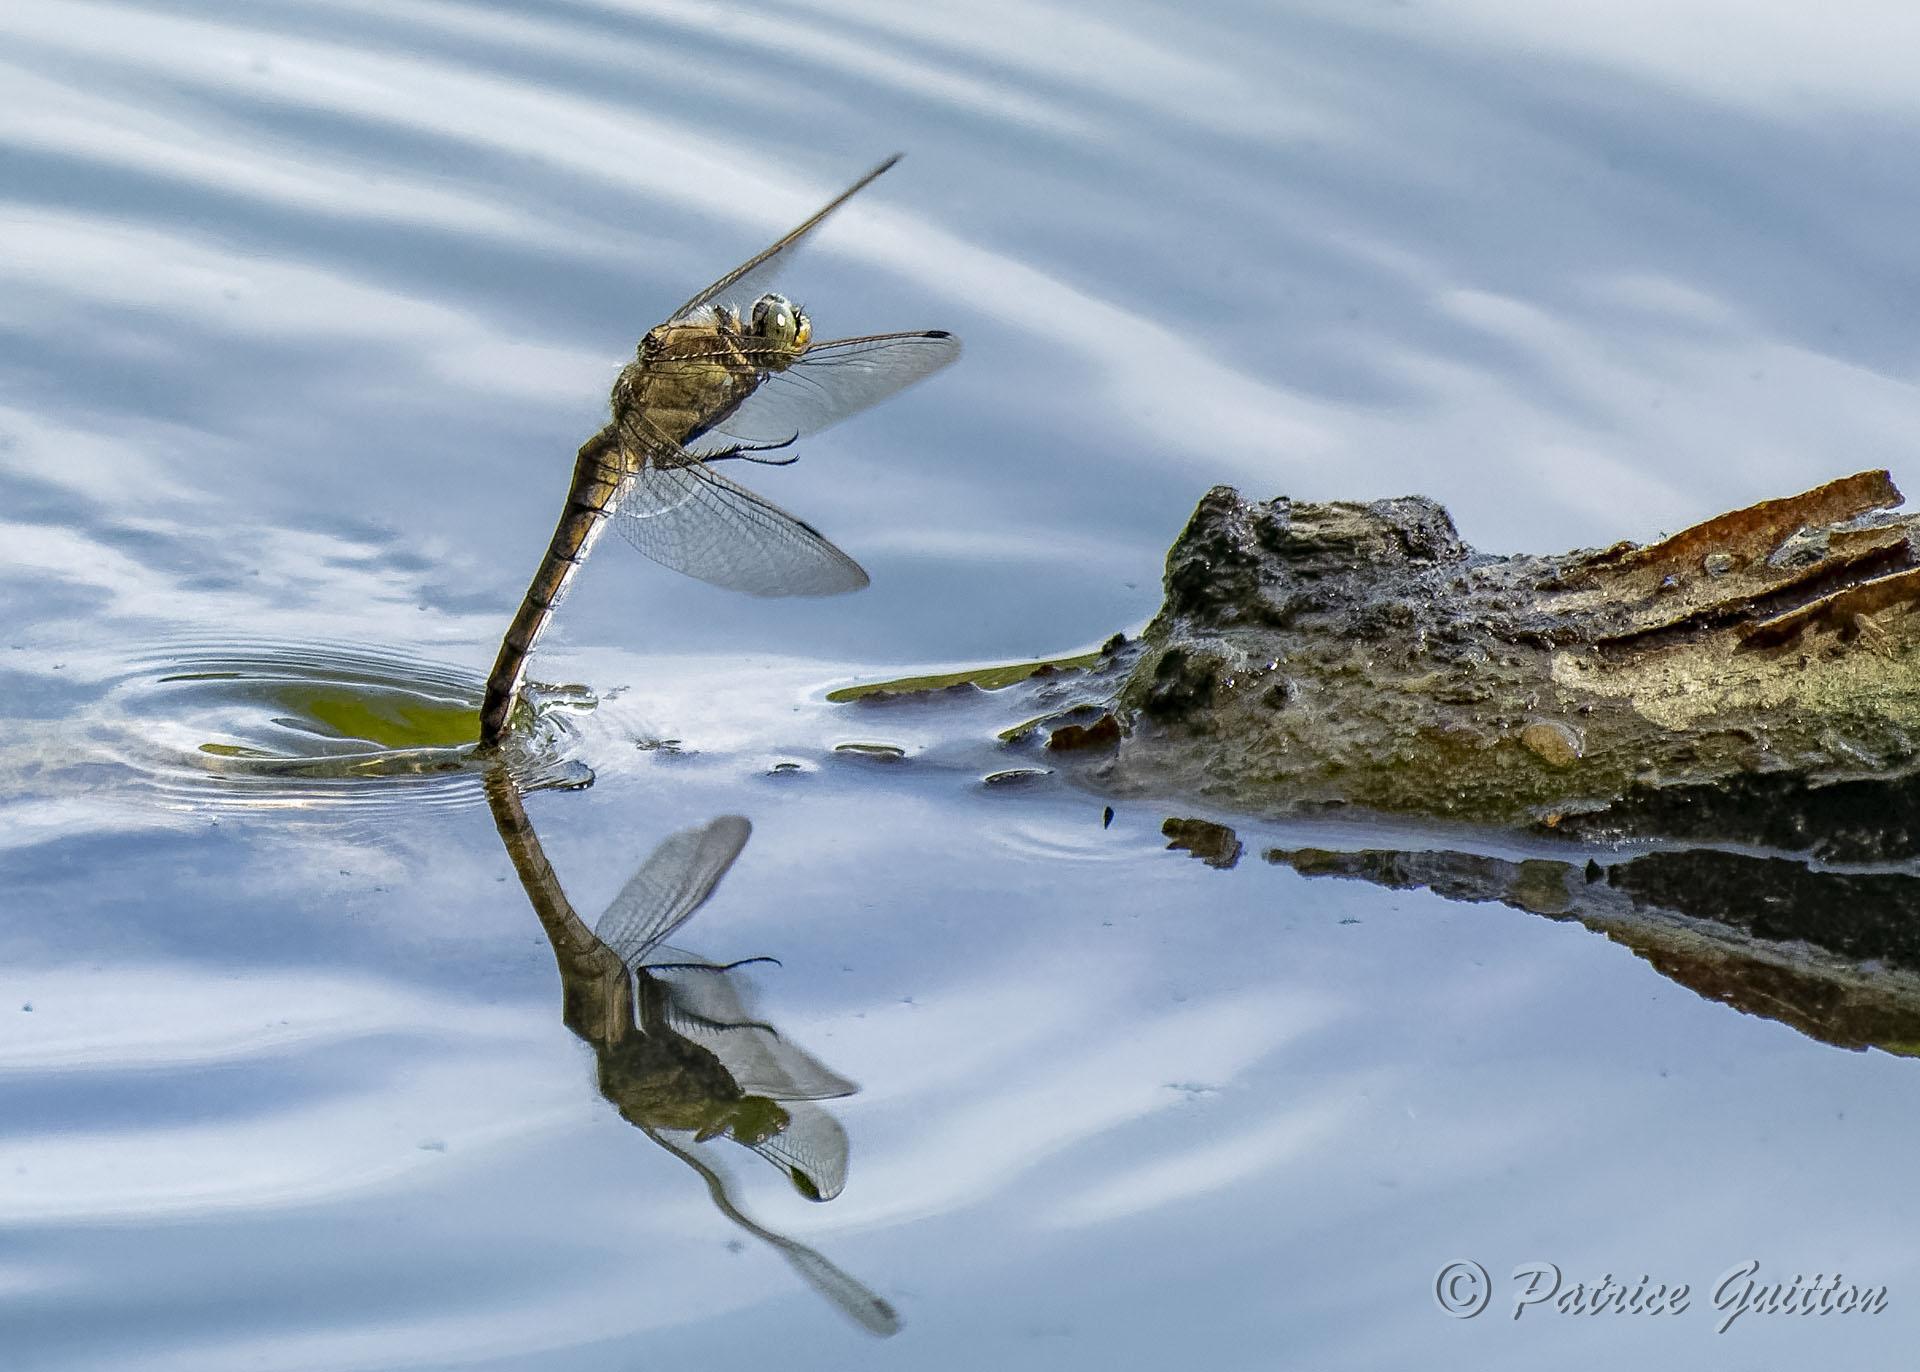 ponte libellule